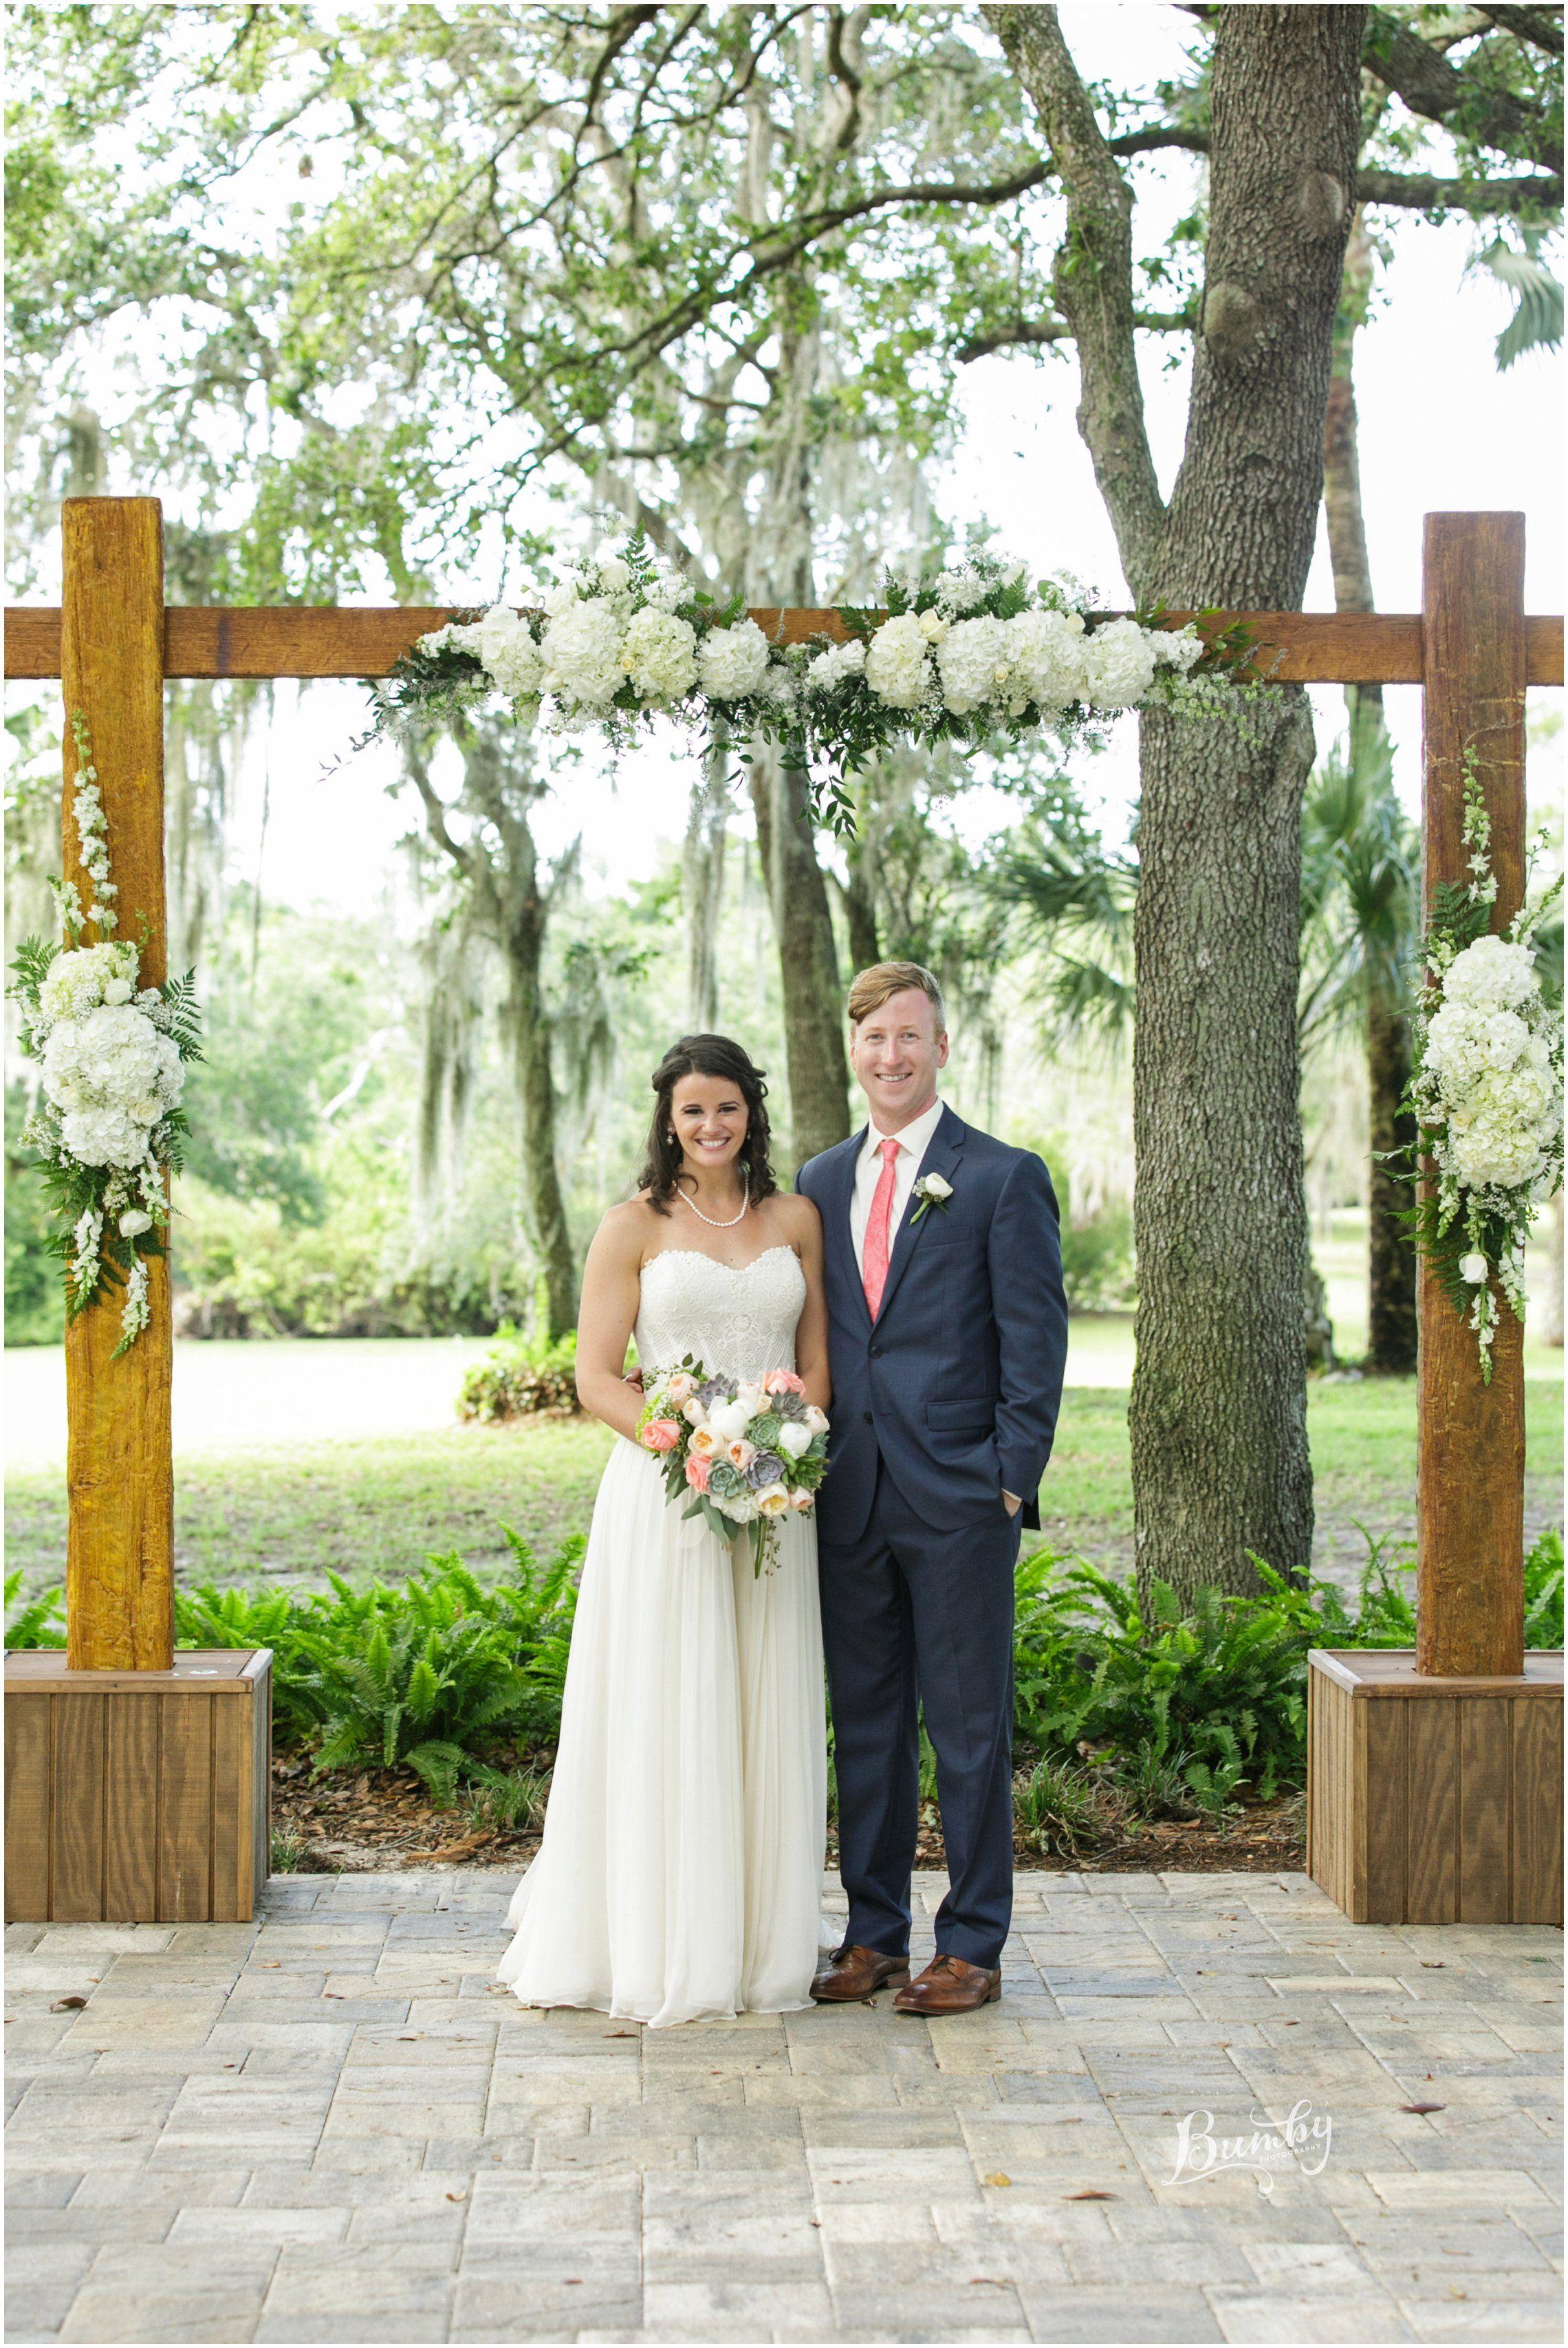 Up The Creek Farms Wedding   Central Florida Photographer - Bumby Photography